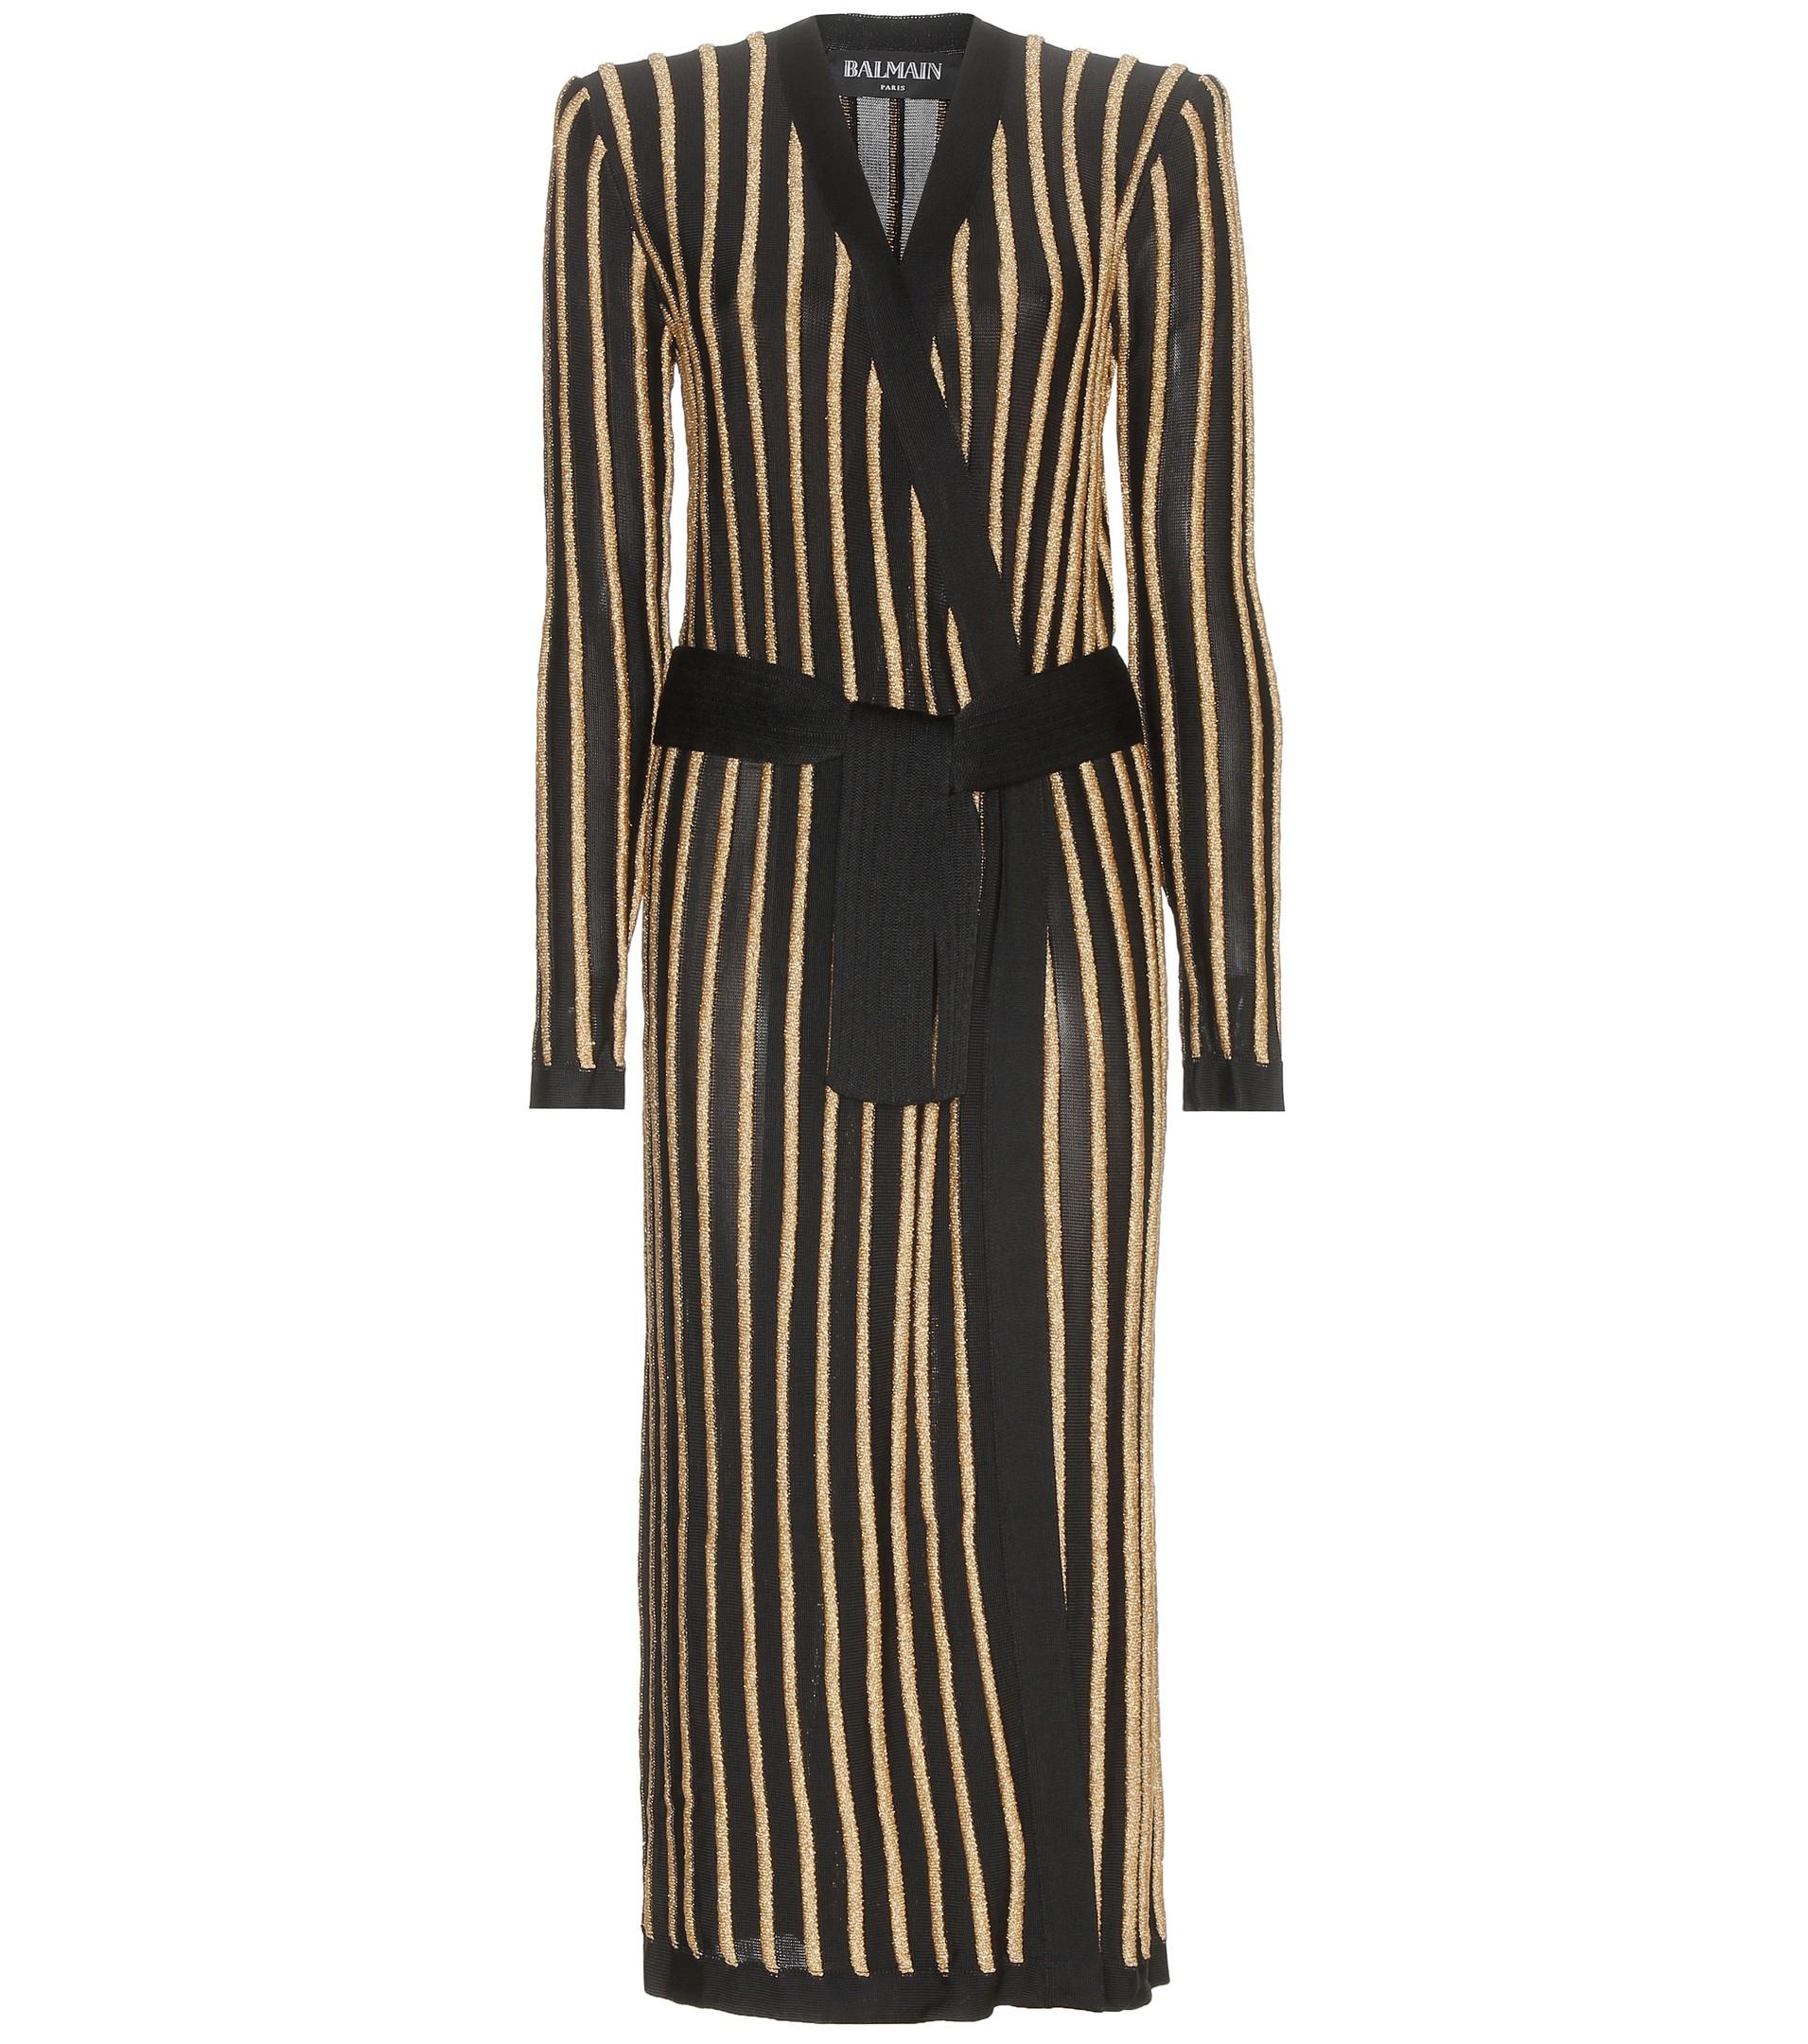 Balmain Striped Long Line Cardigan in Black | Lyst